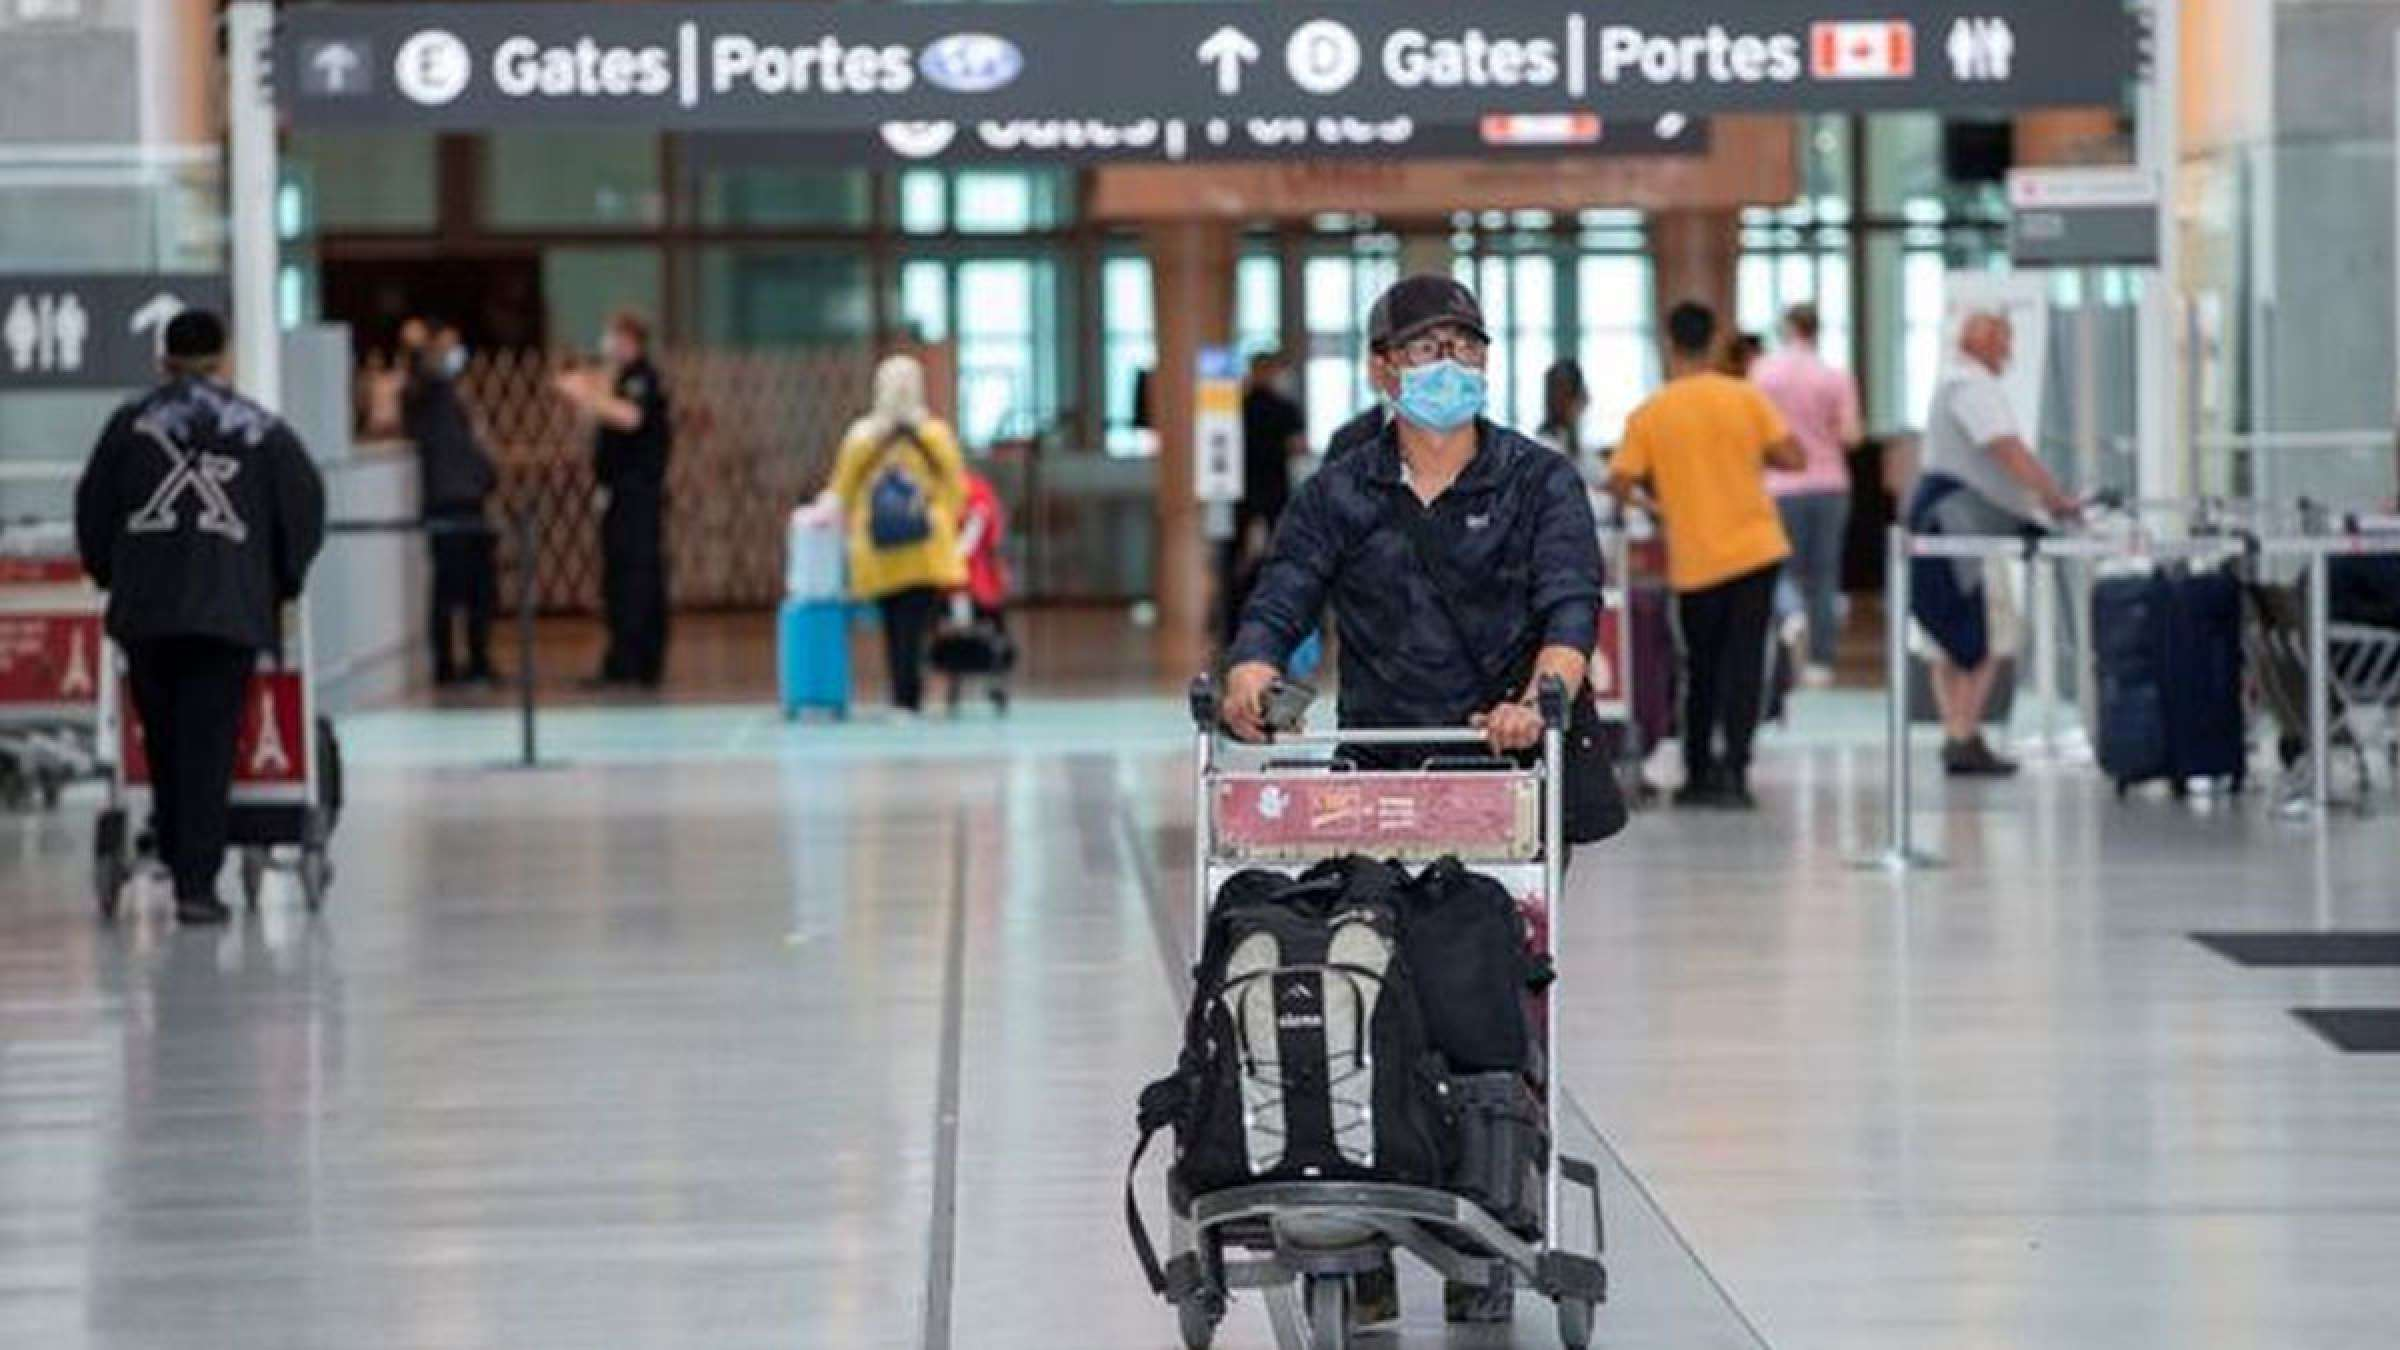 خبر-کانادا-وزیر-بهداشت-کانادا-نه-آخر-سال-به-مسافرت-نروید